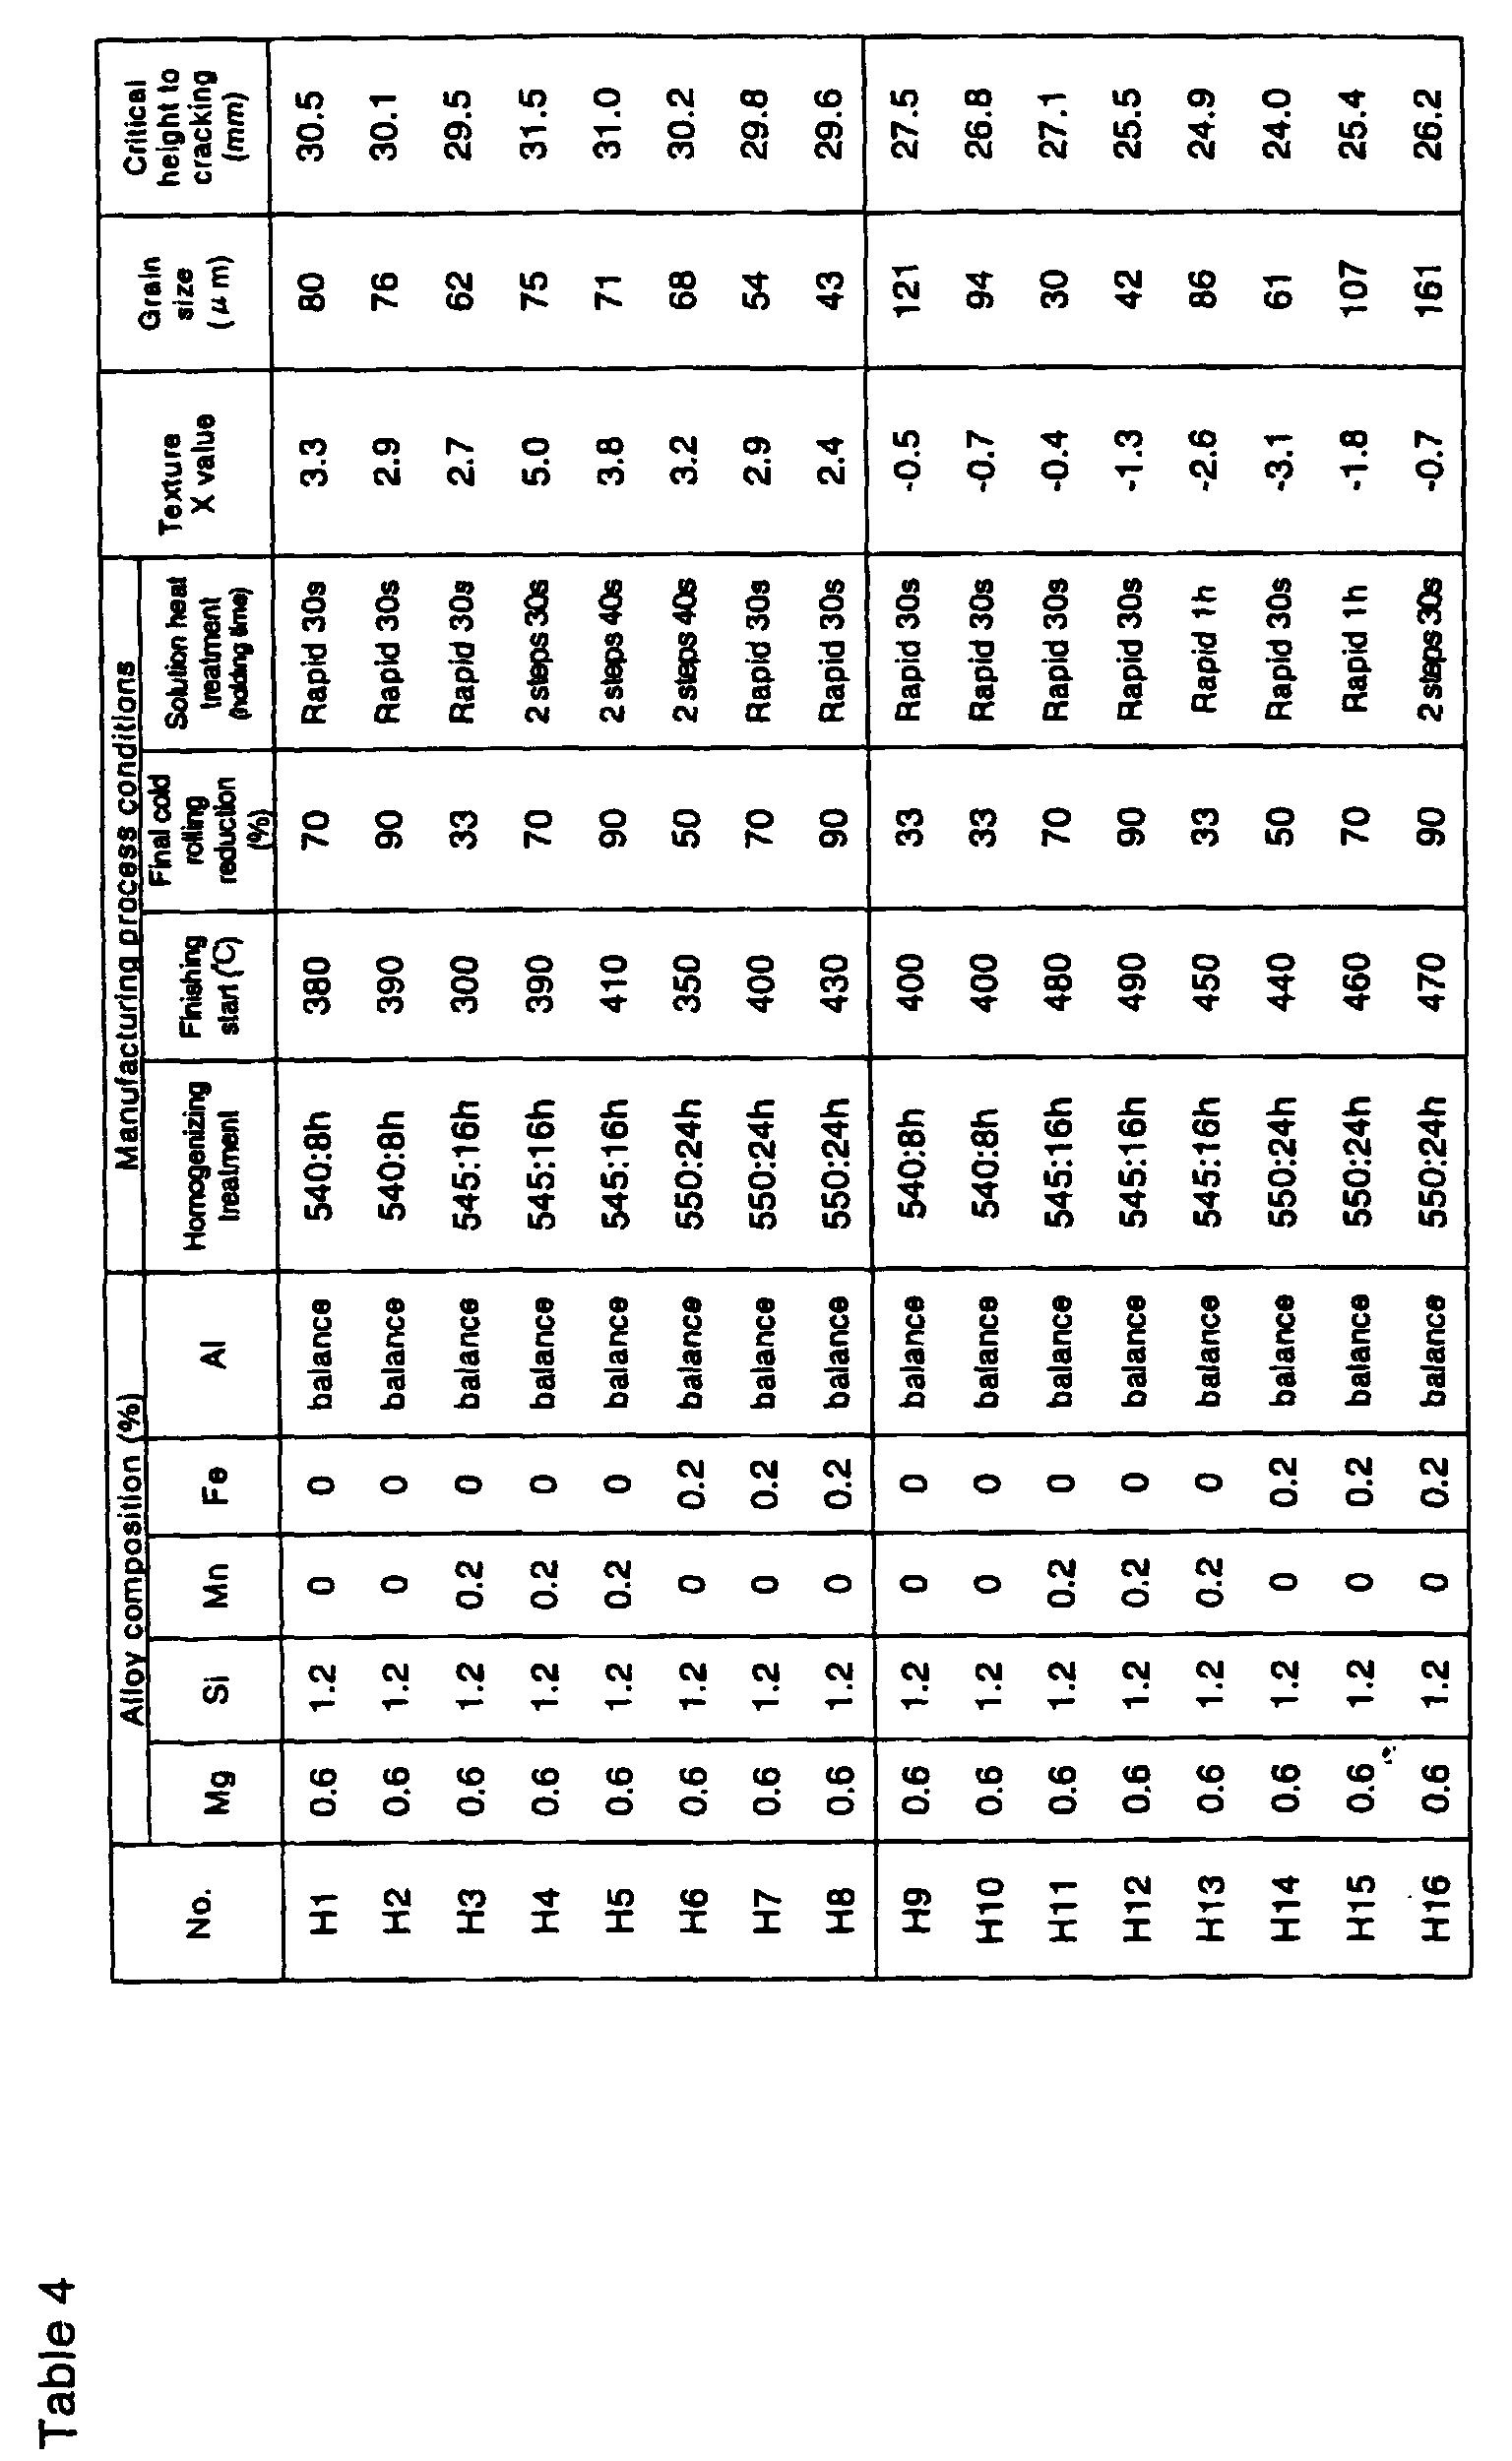 EP1029937A1 - Al-Mg-Si ALLOY SHEET - Google Patents